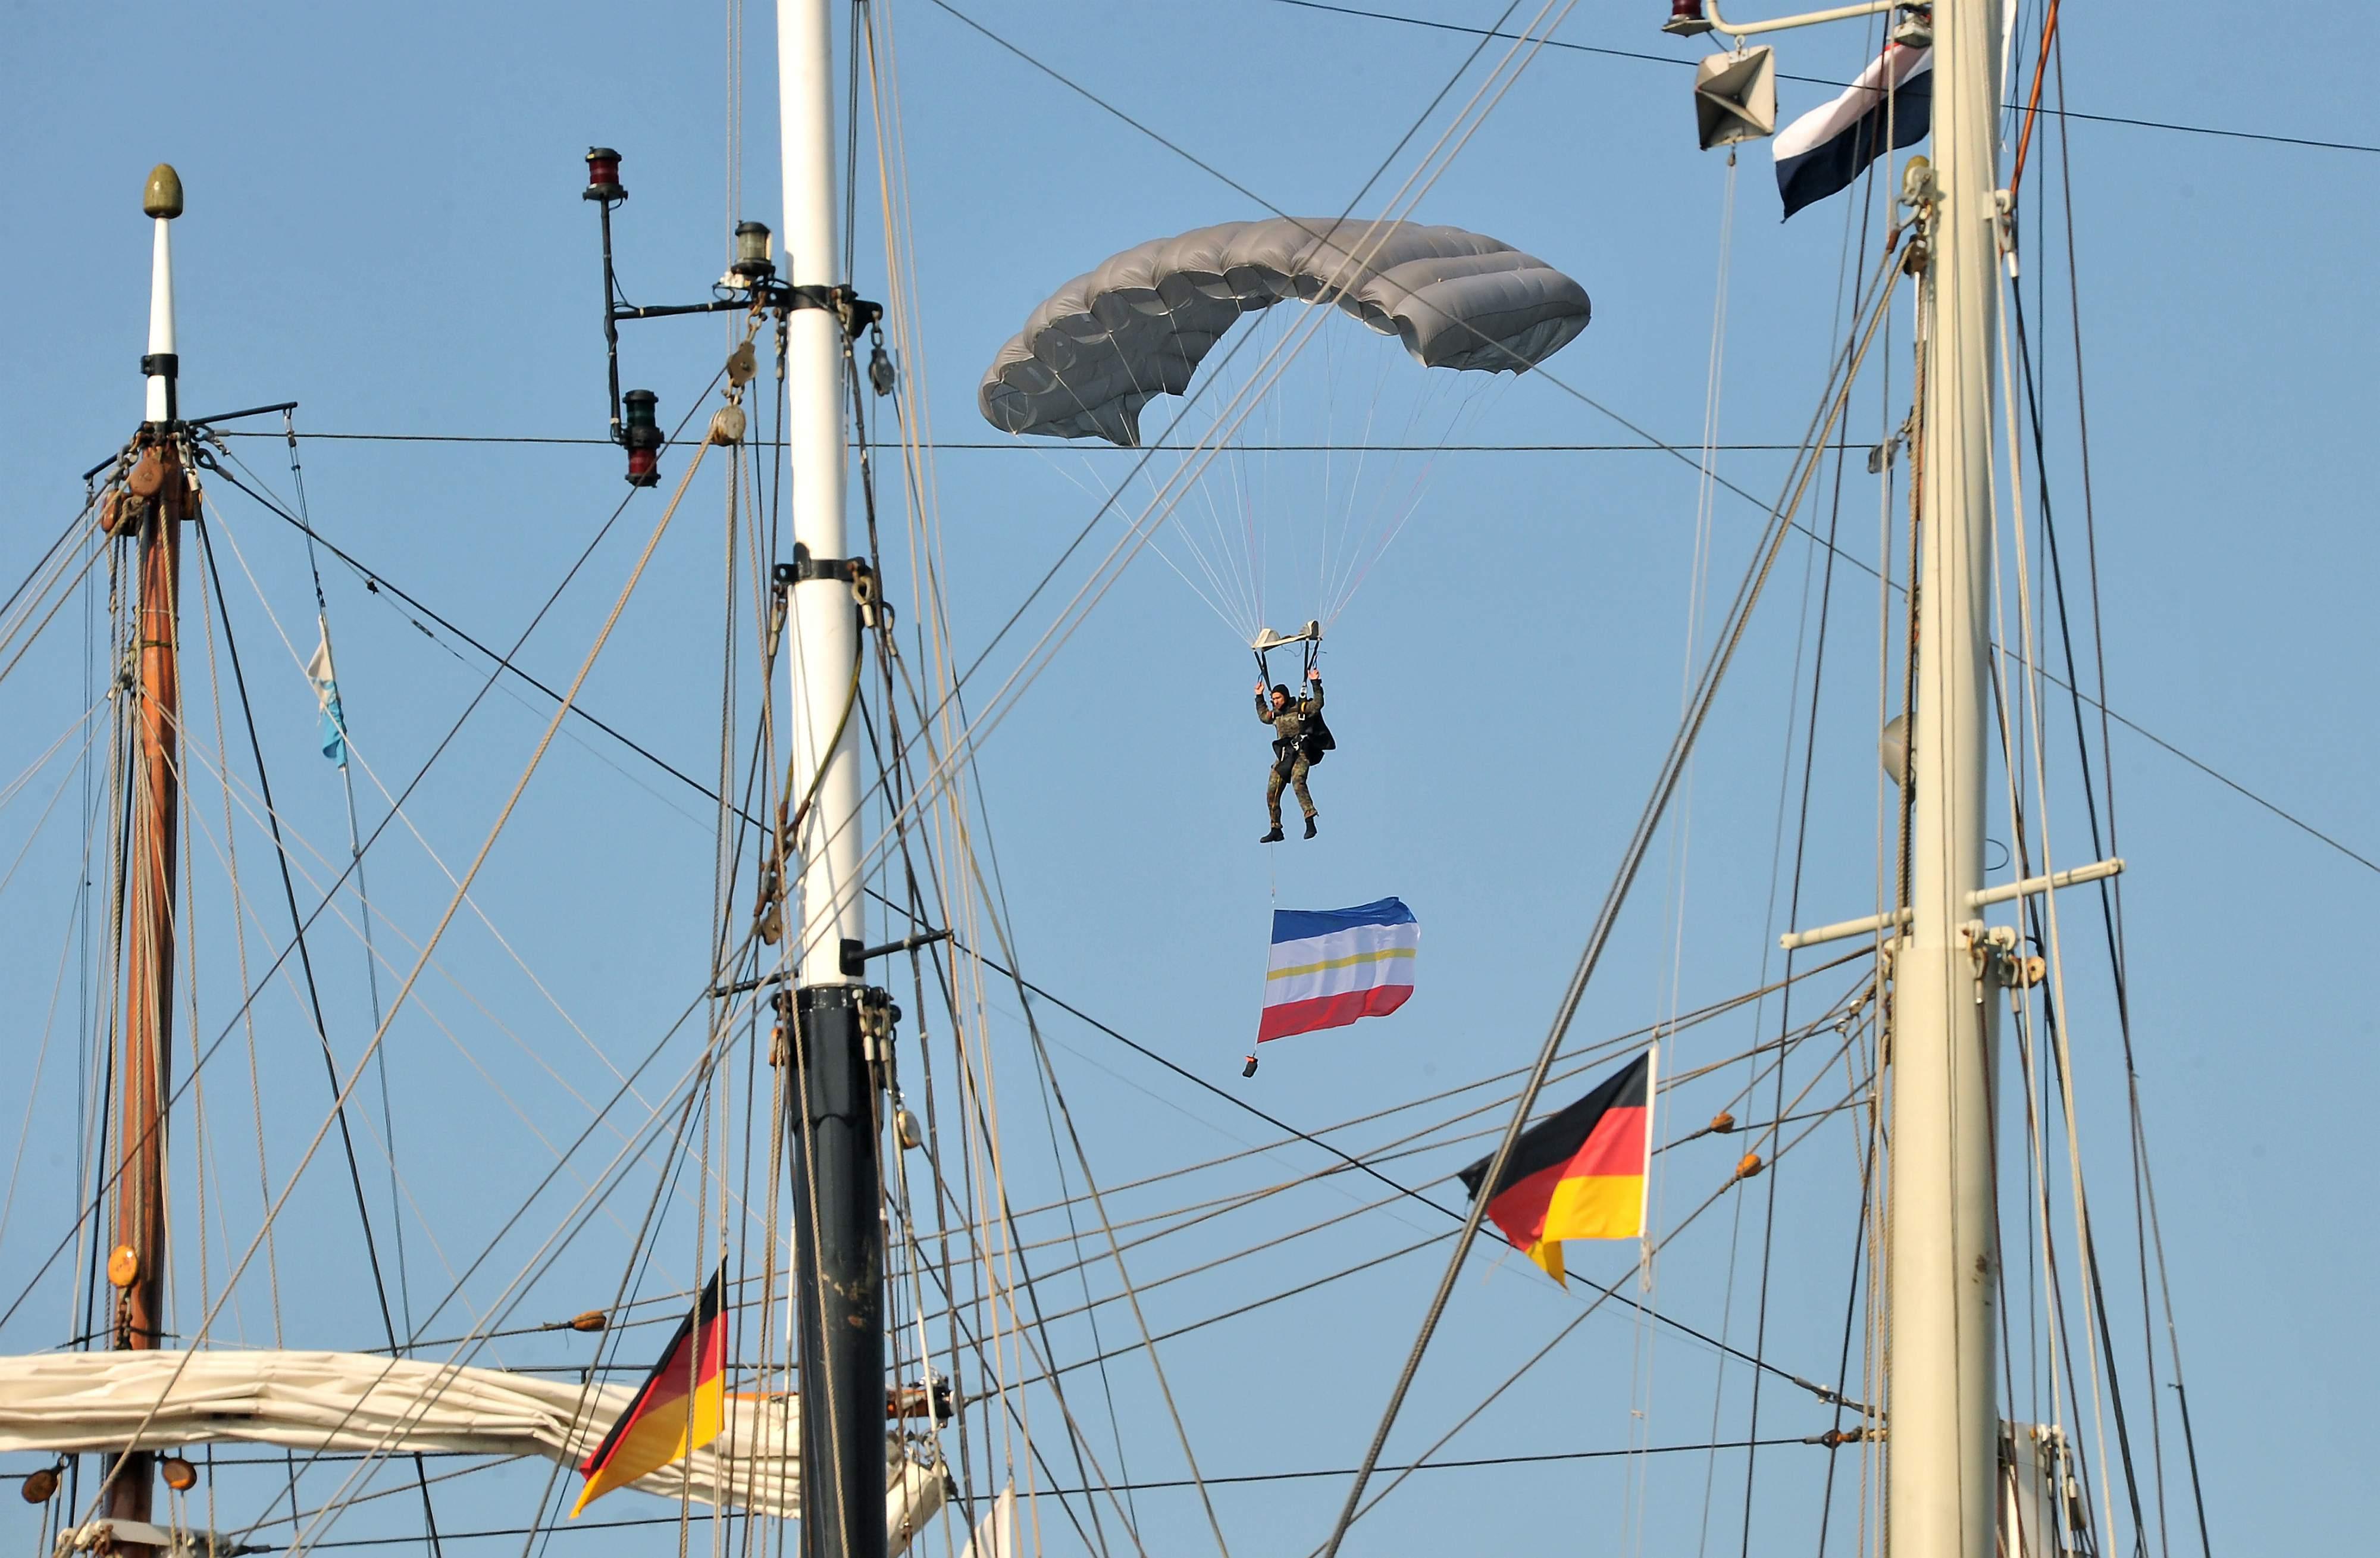 Fallschirmspringer zur Eröffnung der 25. Hanse Sail in Rostock. Foto: Joachim Kloock